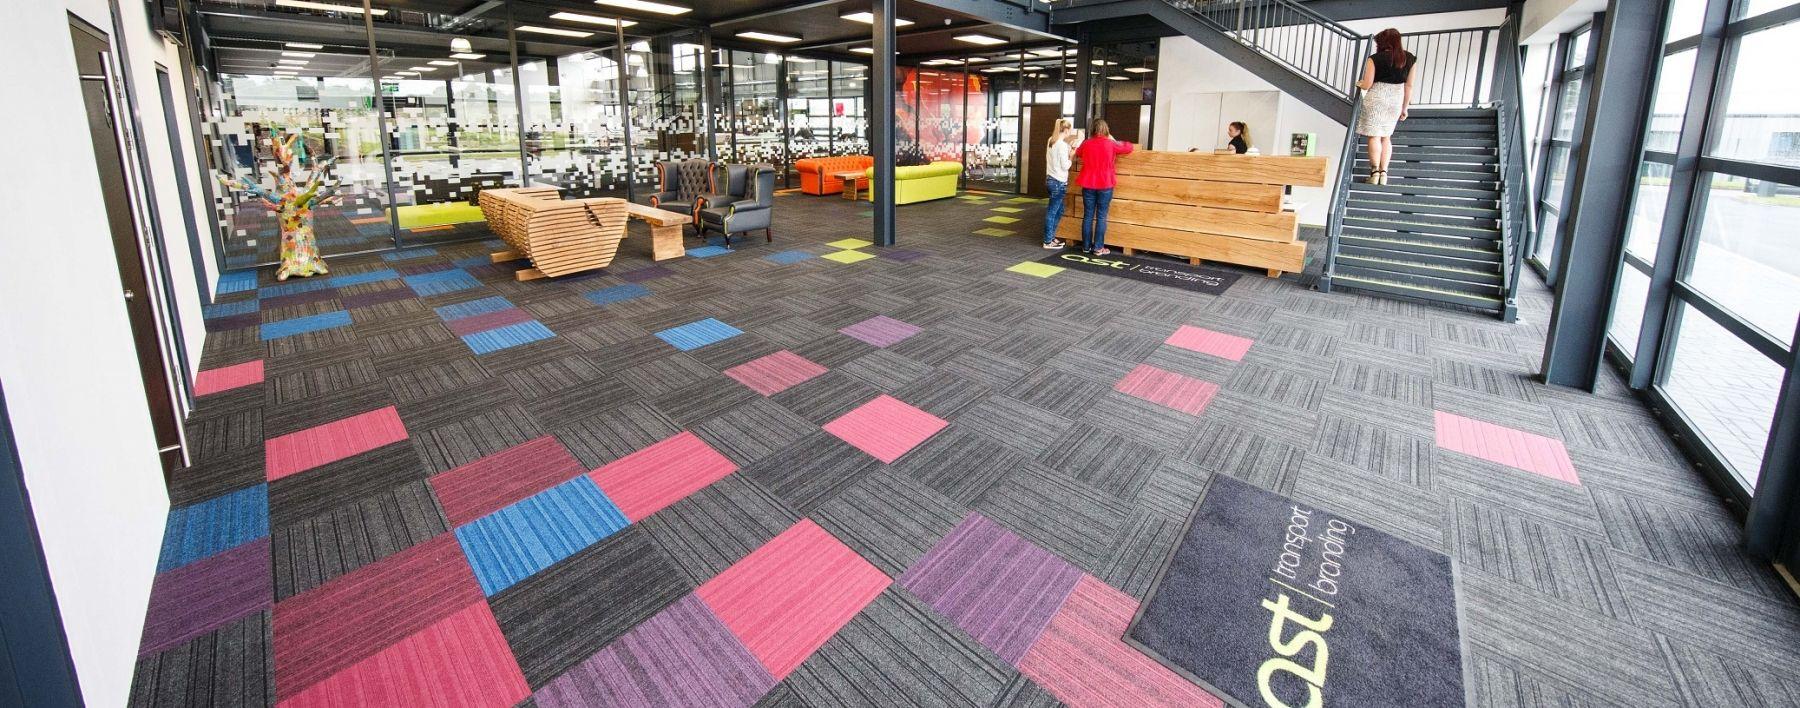 Burmatex Carpet Tiles Ast Burmatex Carpet Flooring